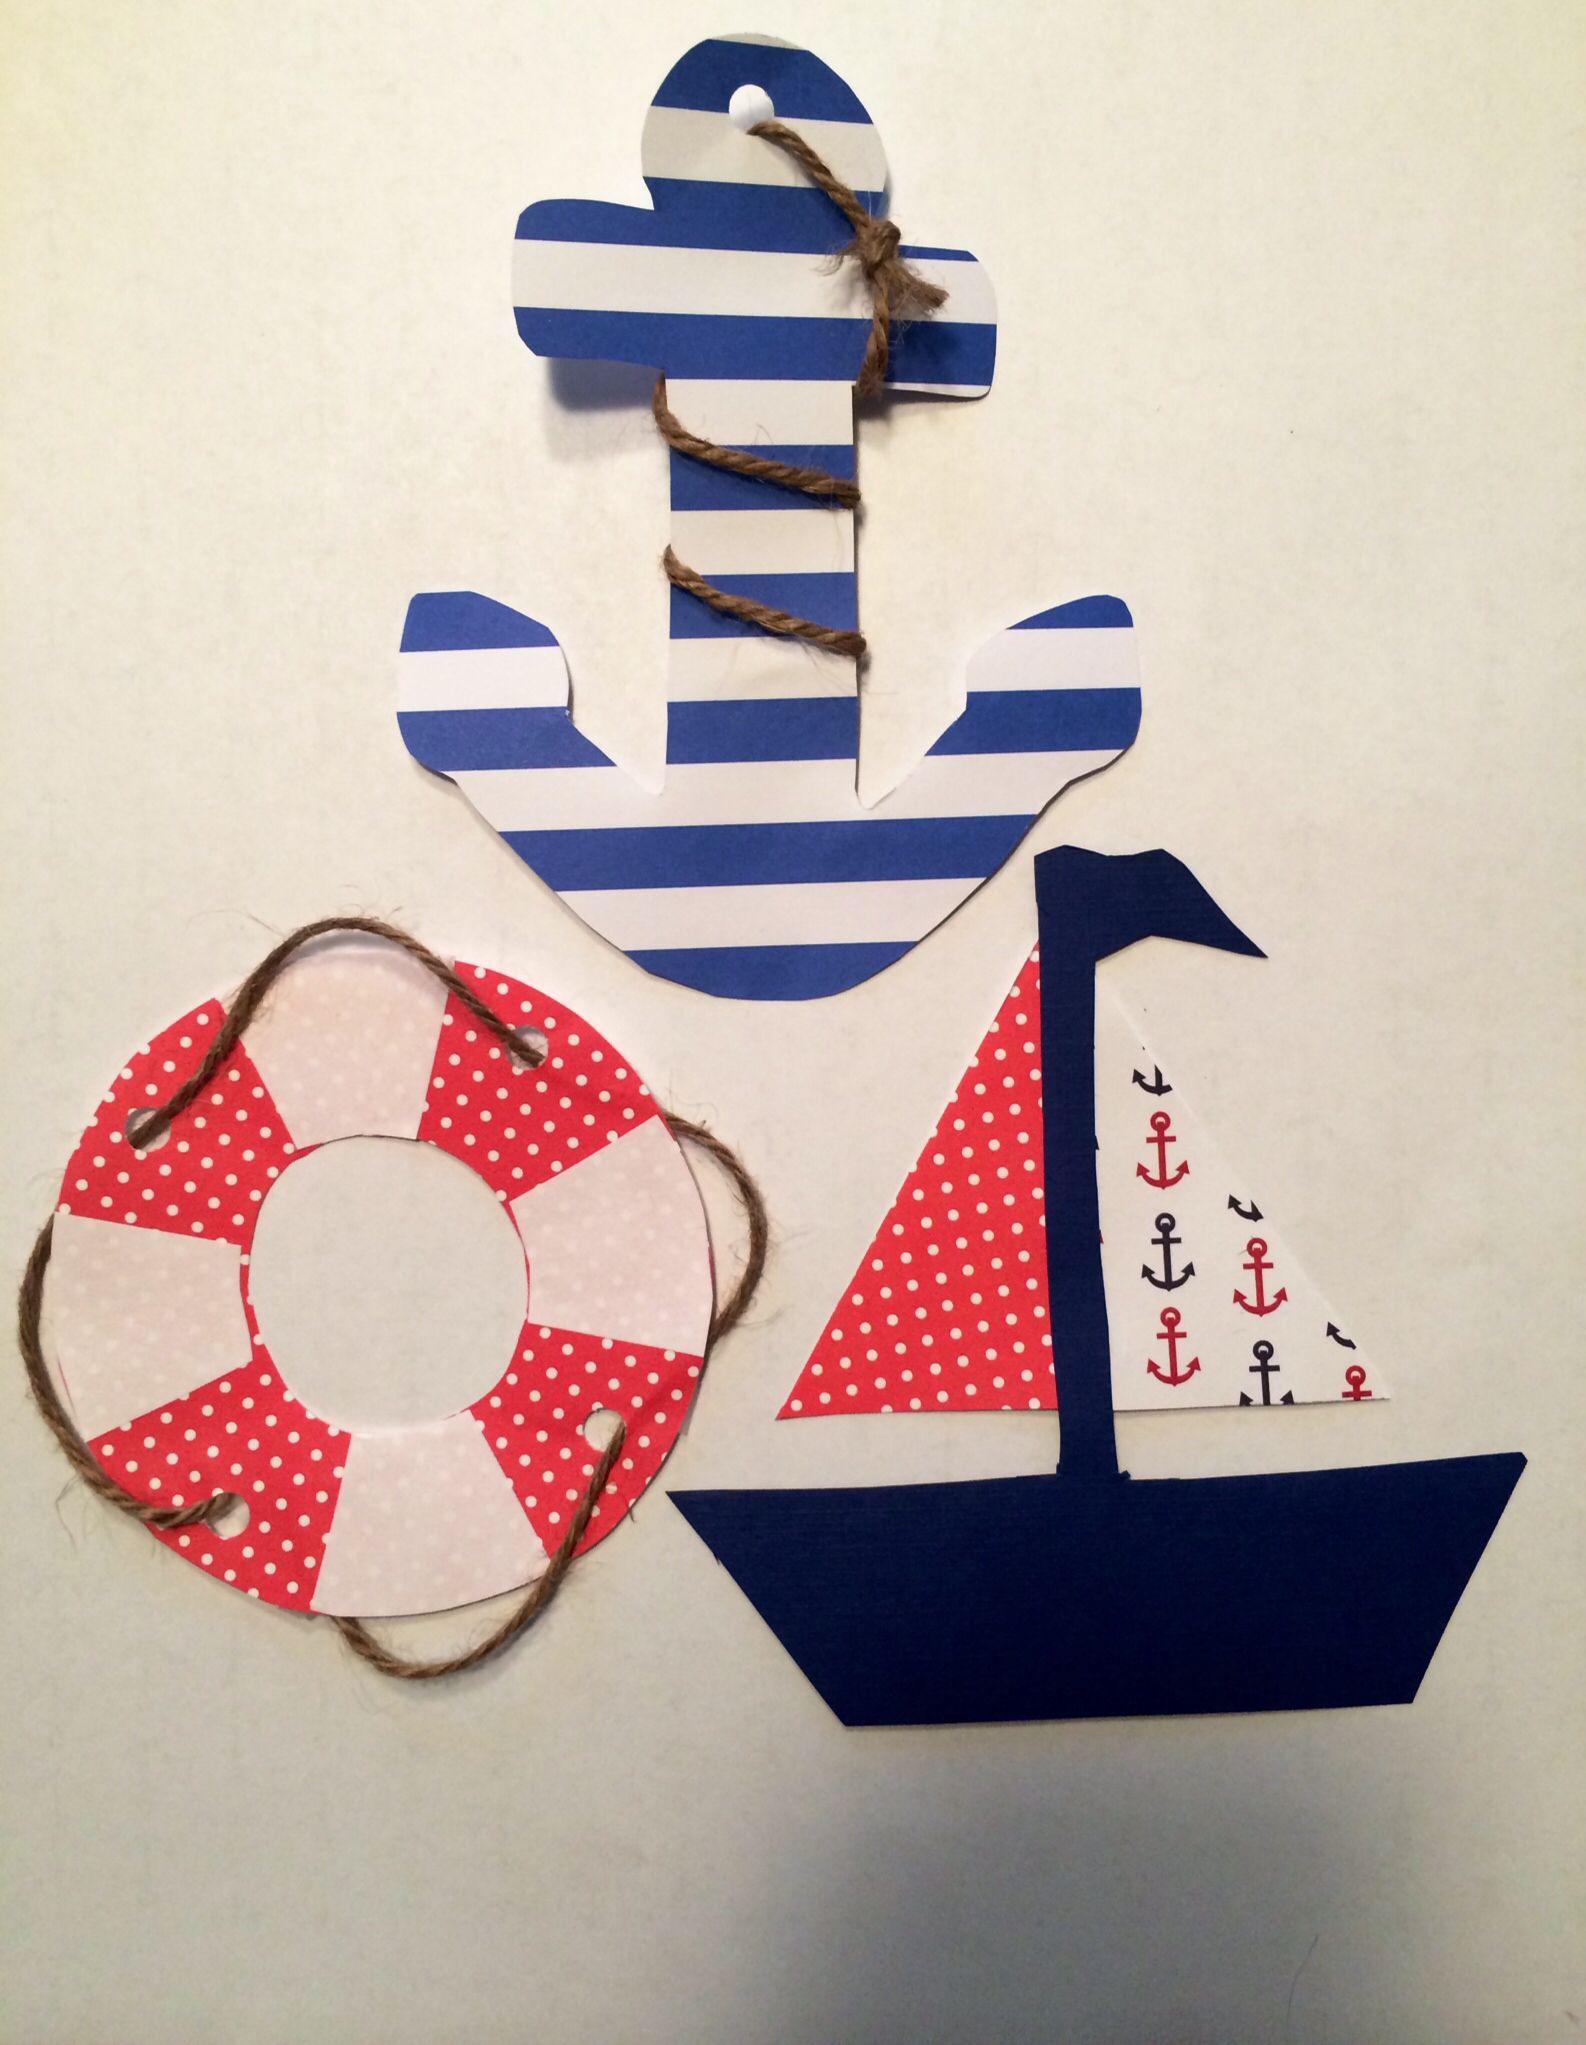 Nautical door tags & Nautical door tags | RA World | Pinterest | Door tags Doors and ... Pezcame.Com